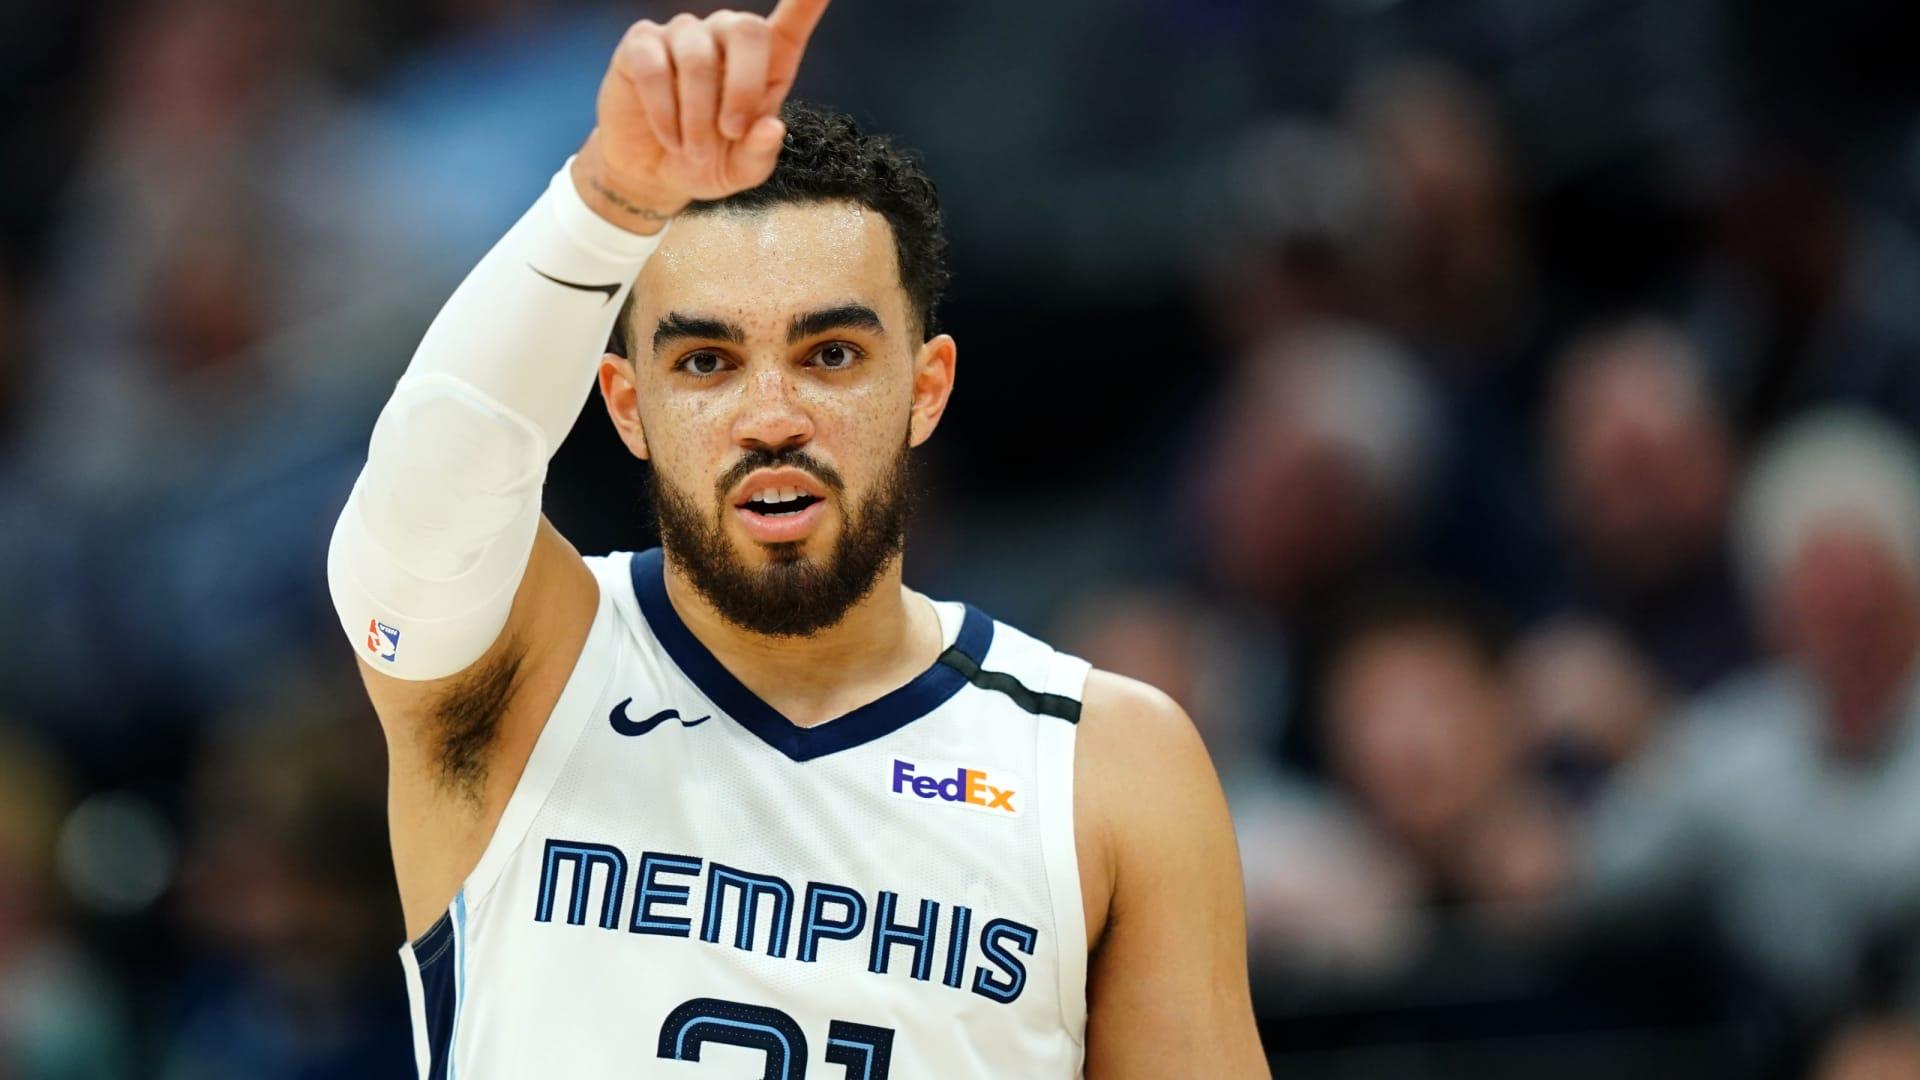 Duke basketball: Tyus Jones finds unpleasant surprise in Orlando hotel